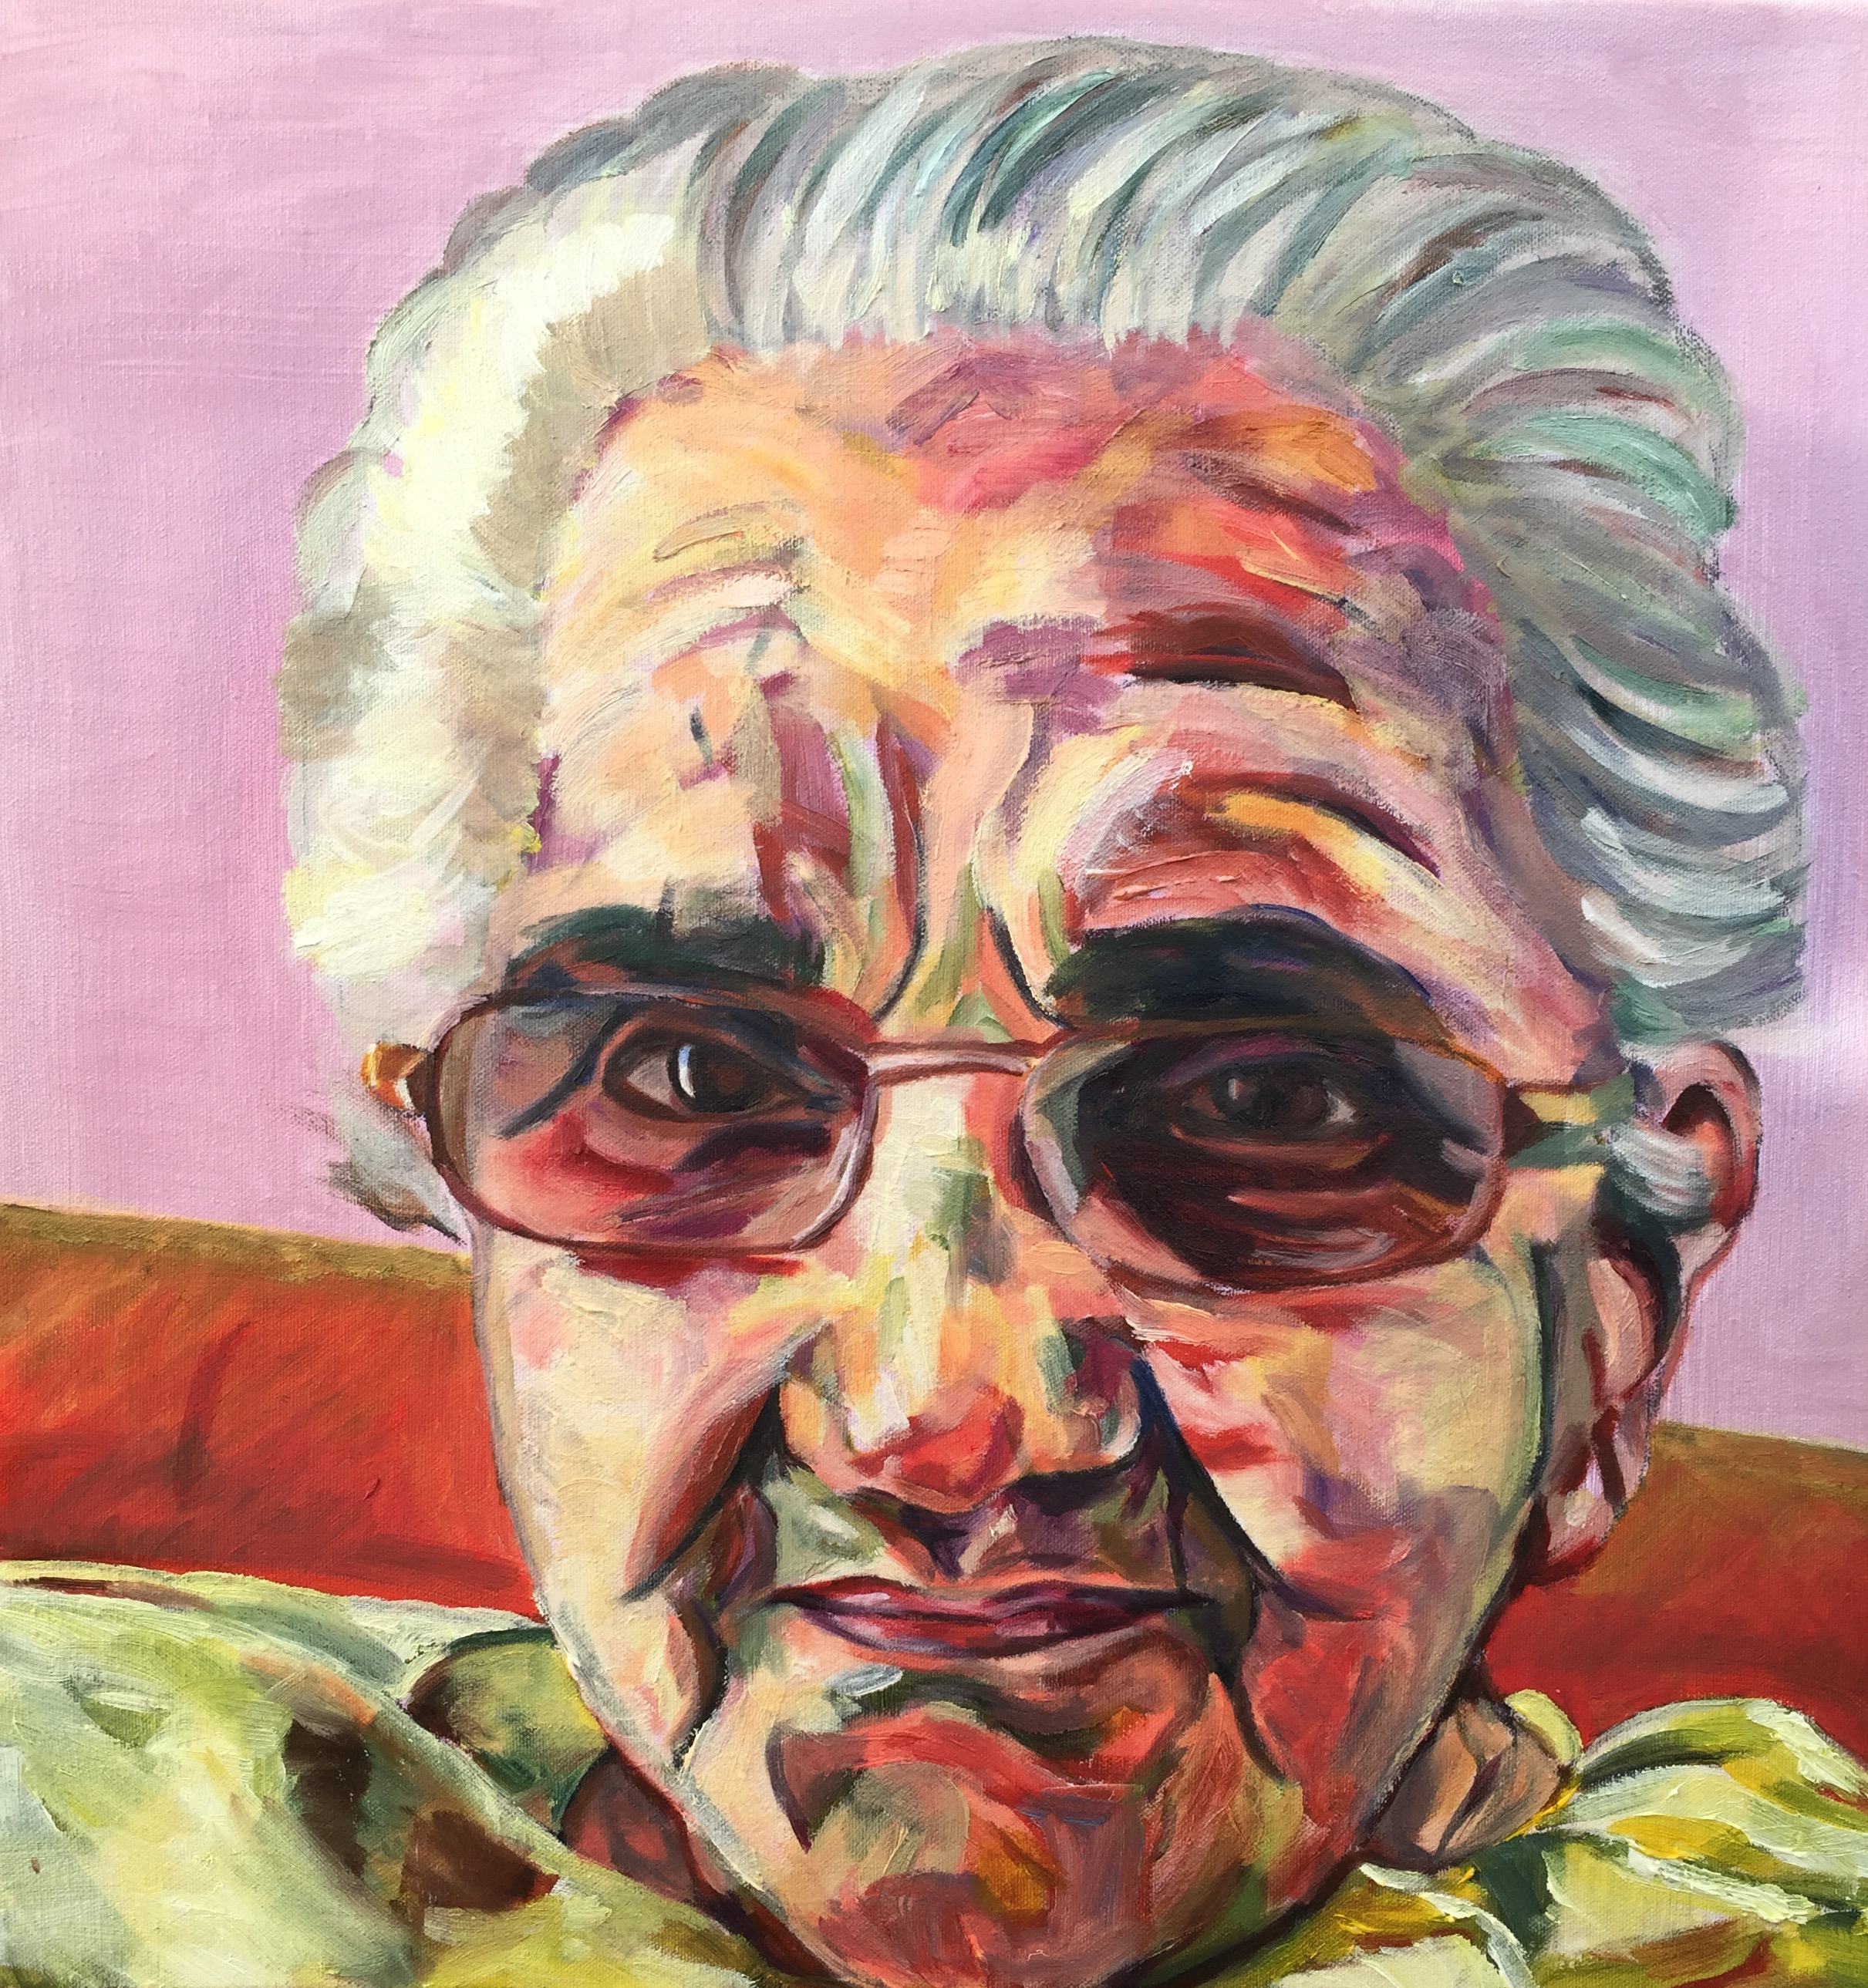 "Grandma | Oil on canvas | 24 x 24"" | 2015"